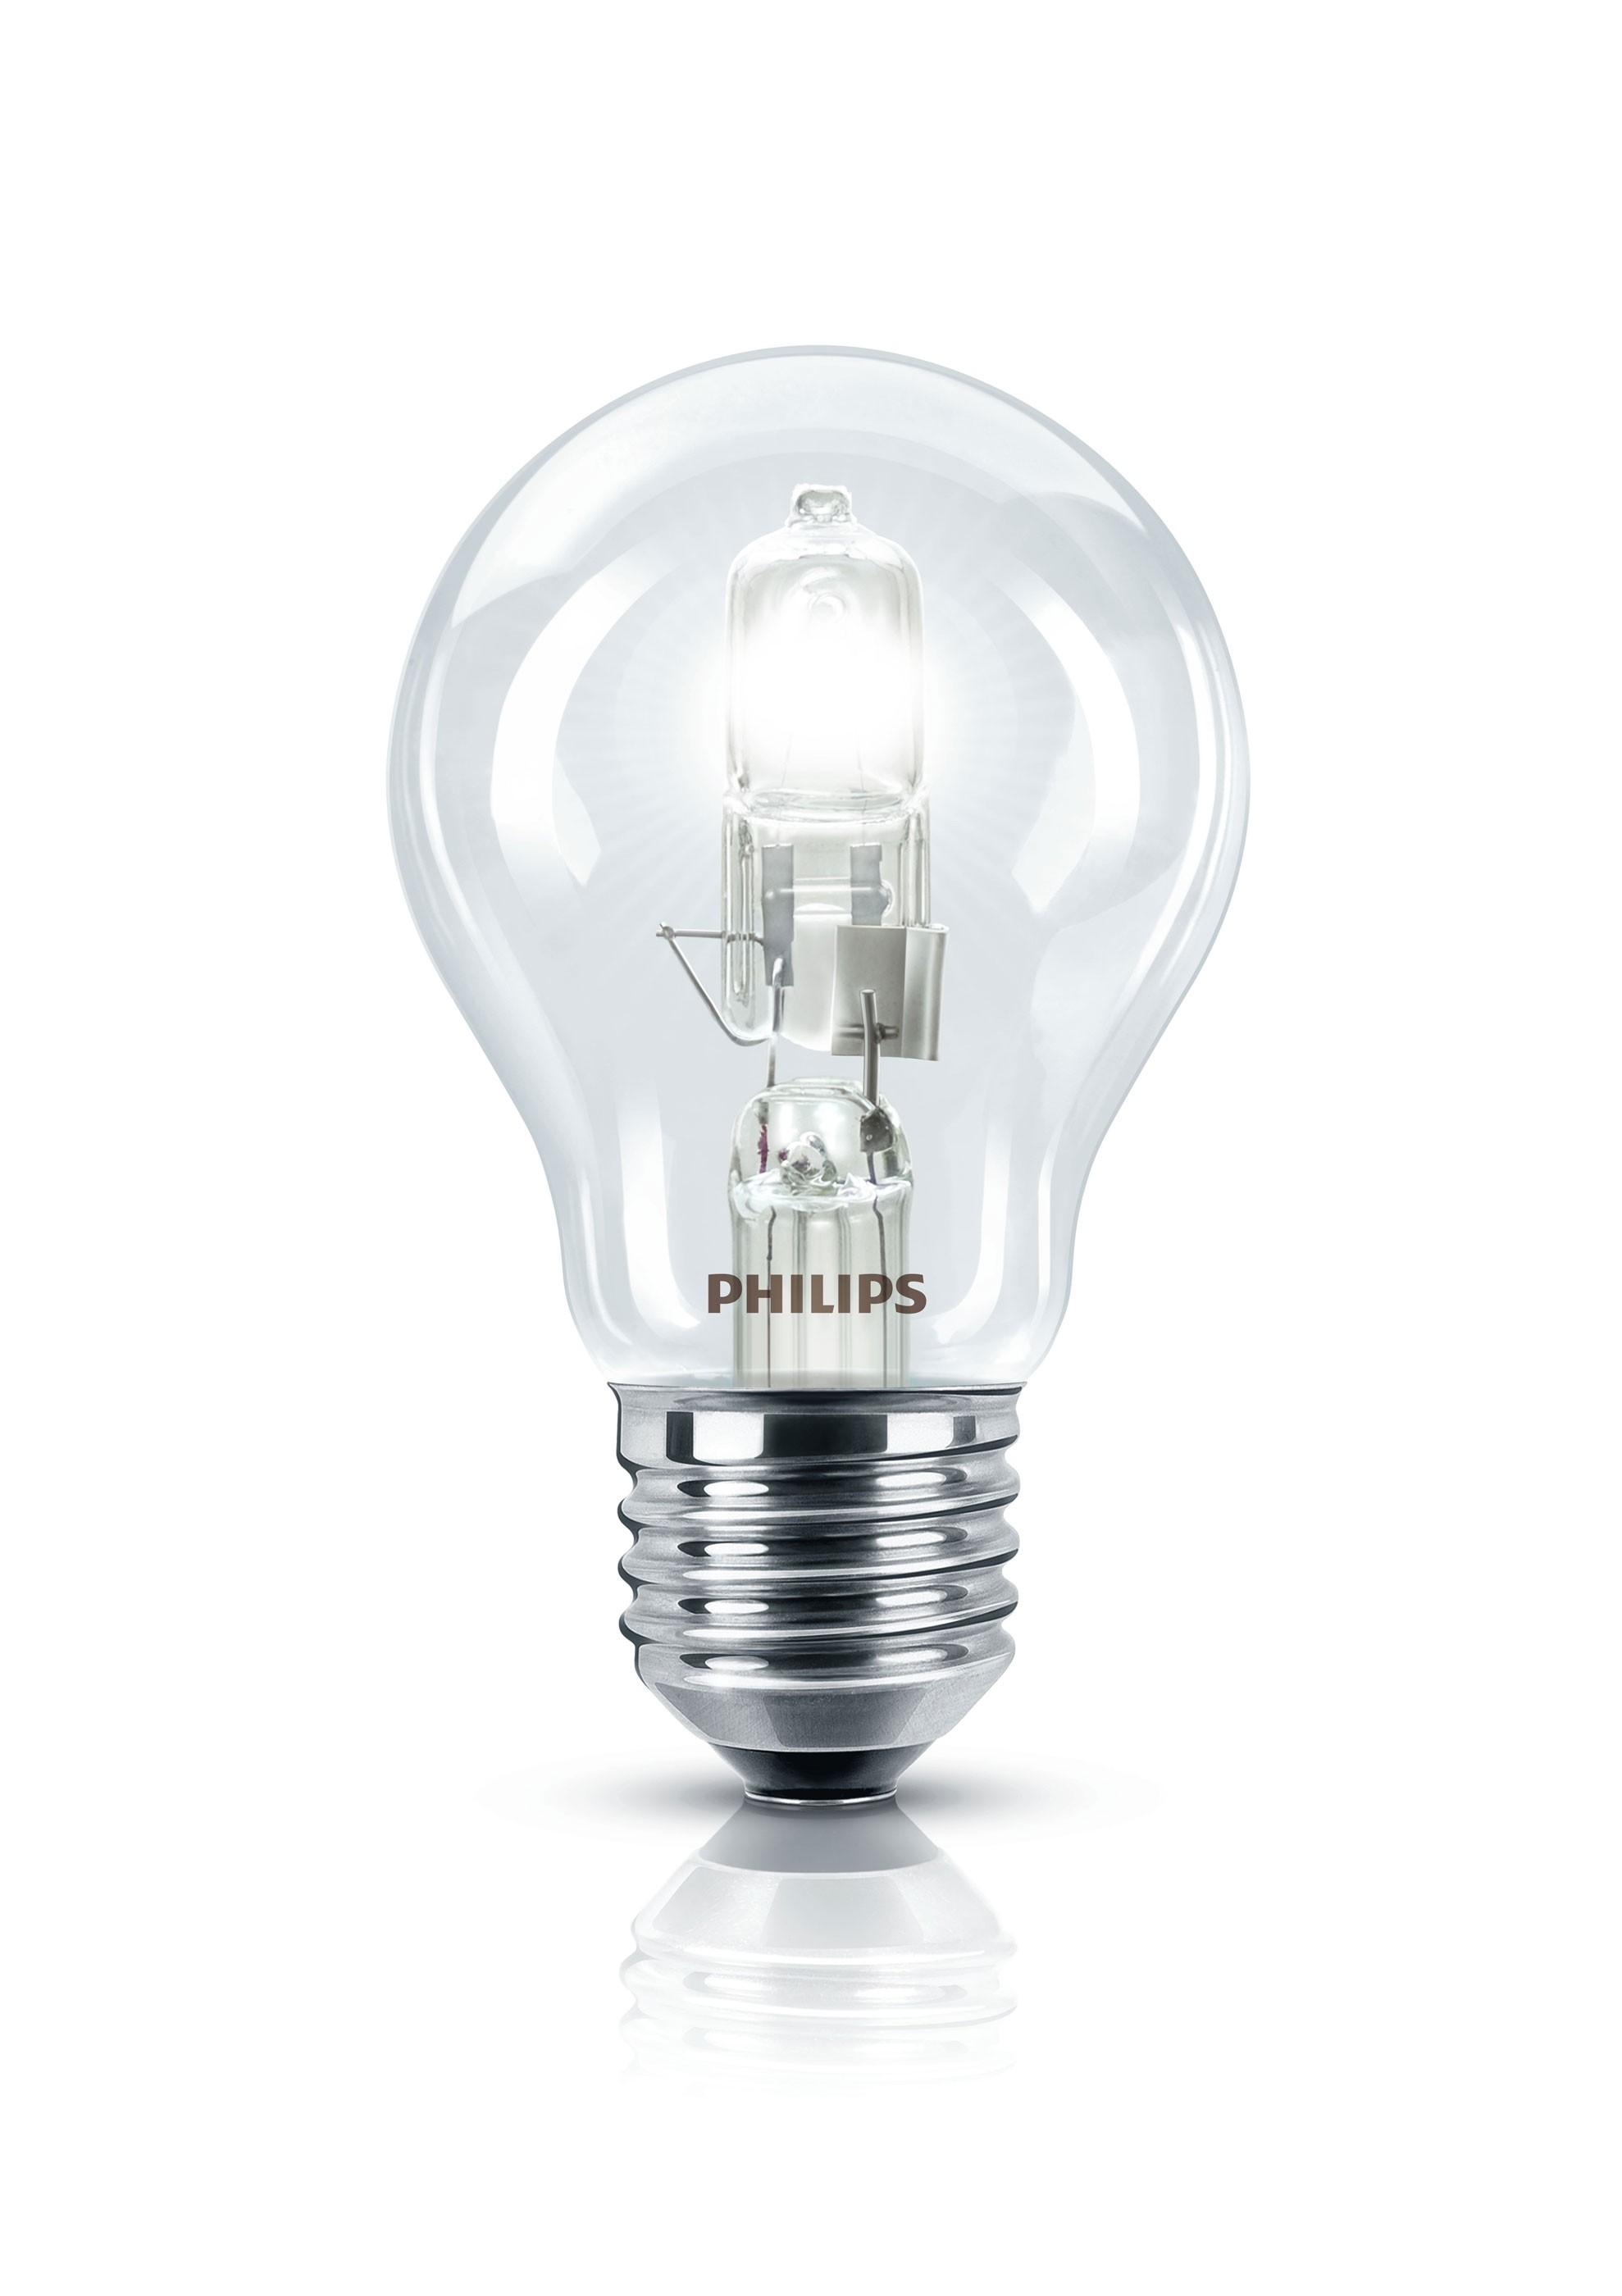 Philips EcoClassic30 Halogenlampe E27 dimmbar 25Watt warm weiß Bild 1